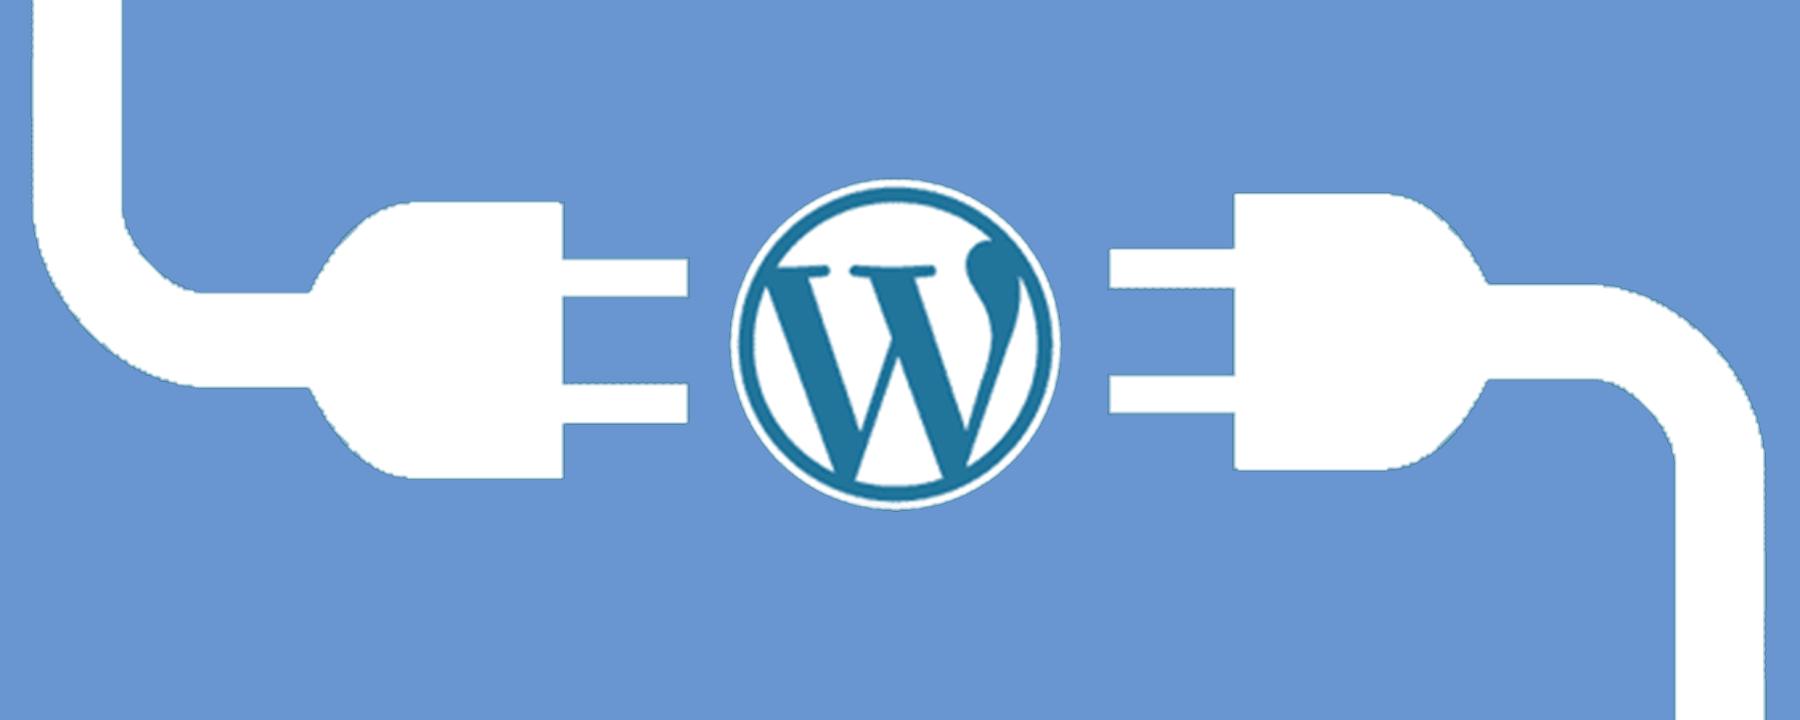 Wordpress 4.7.3 ya disponible, actualiza ahora